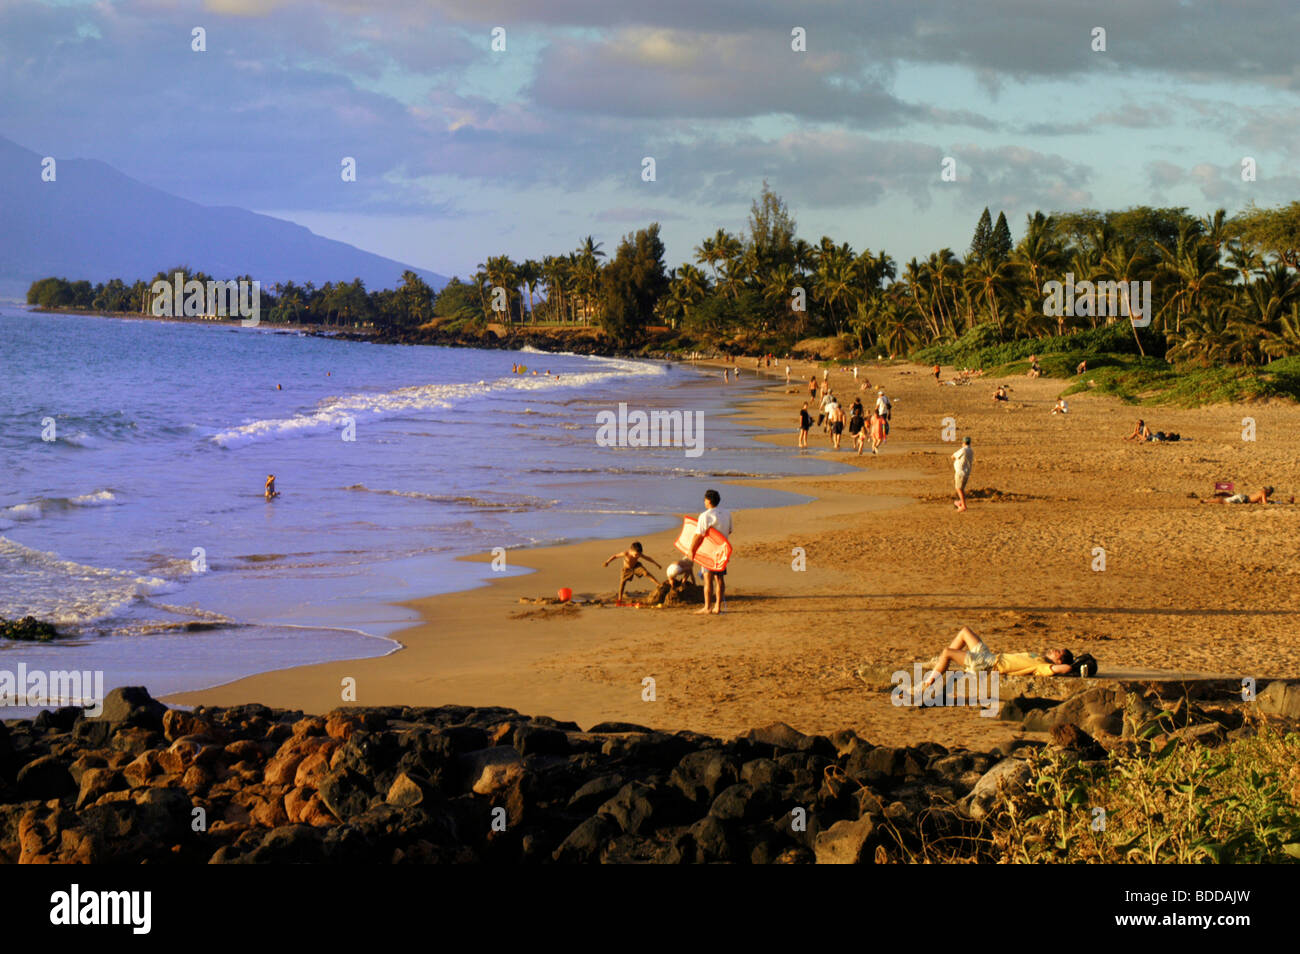 Relaxing on Ulua Beach on Maui Stock Photo